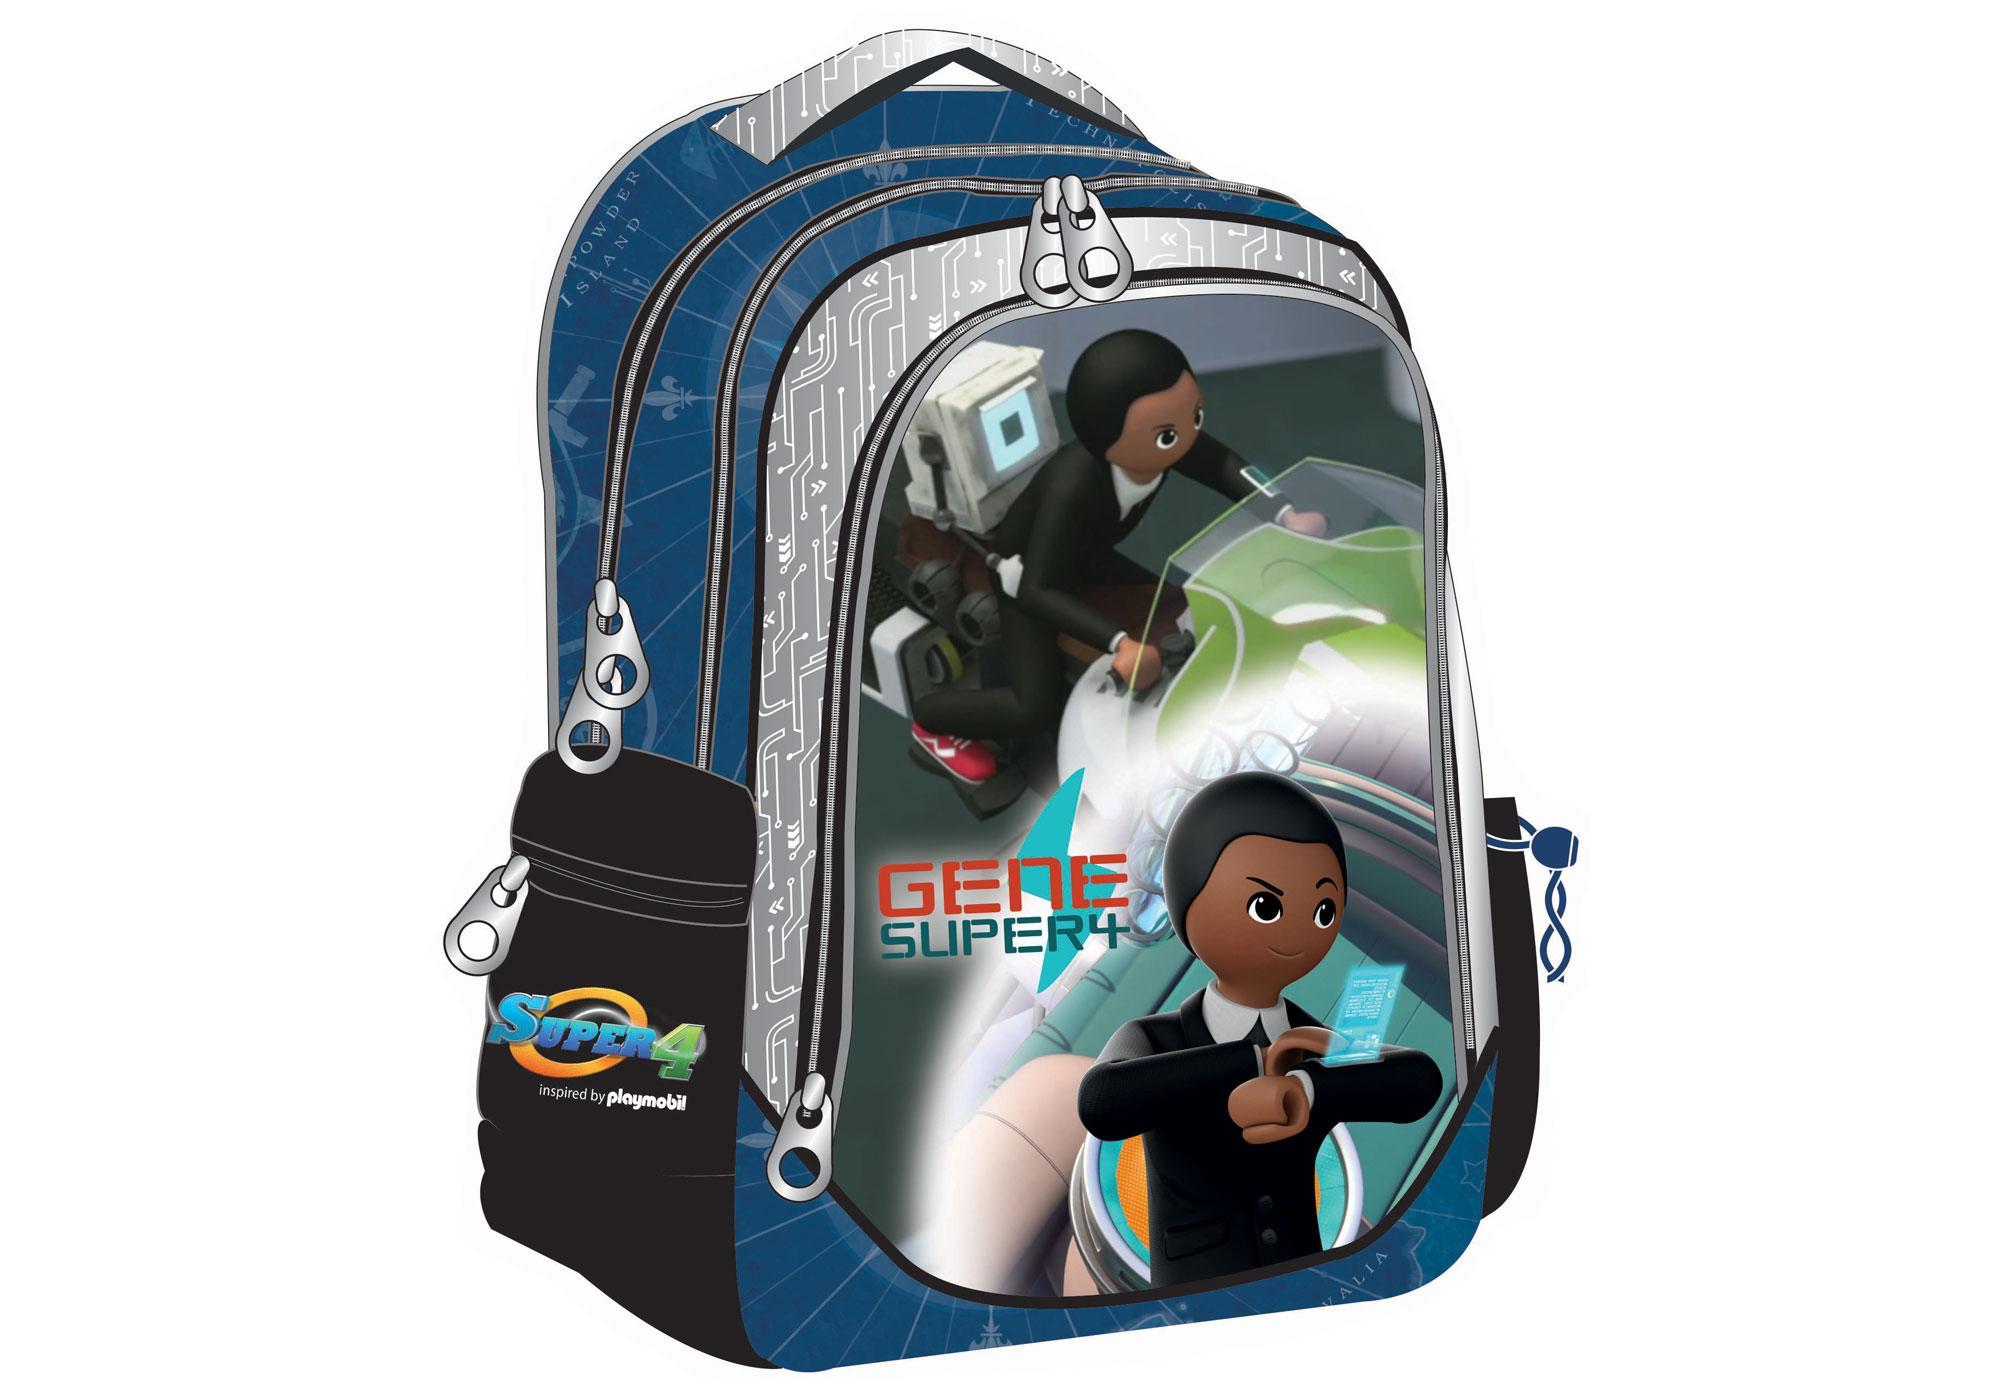 http://media.playmobil.com/i/playmobil/80064_product_detail/Kinder-Rucksack - Super 4 Gene